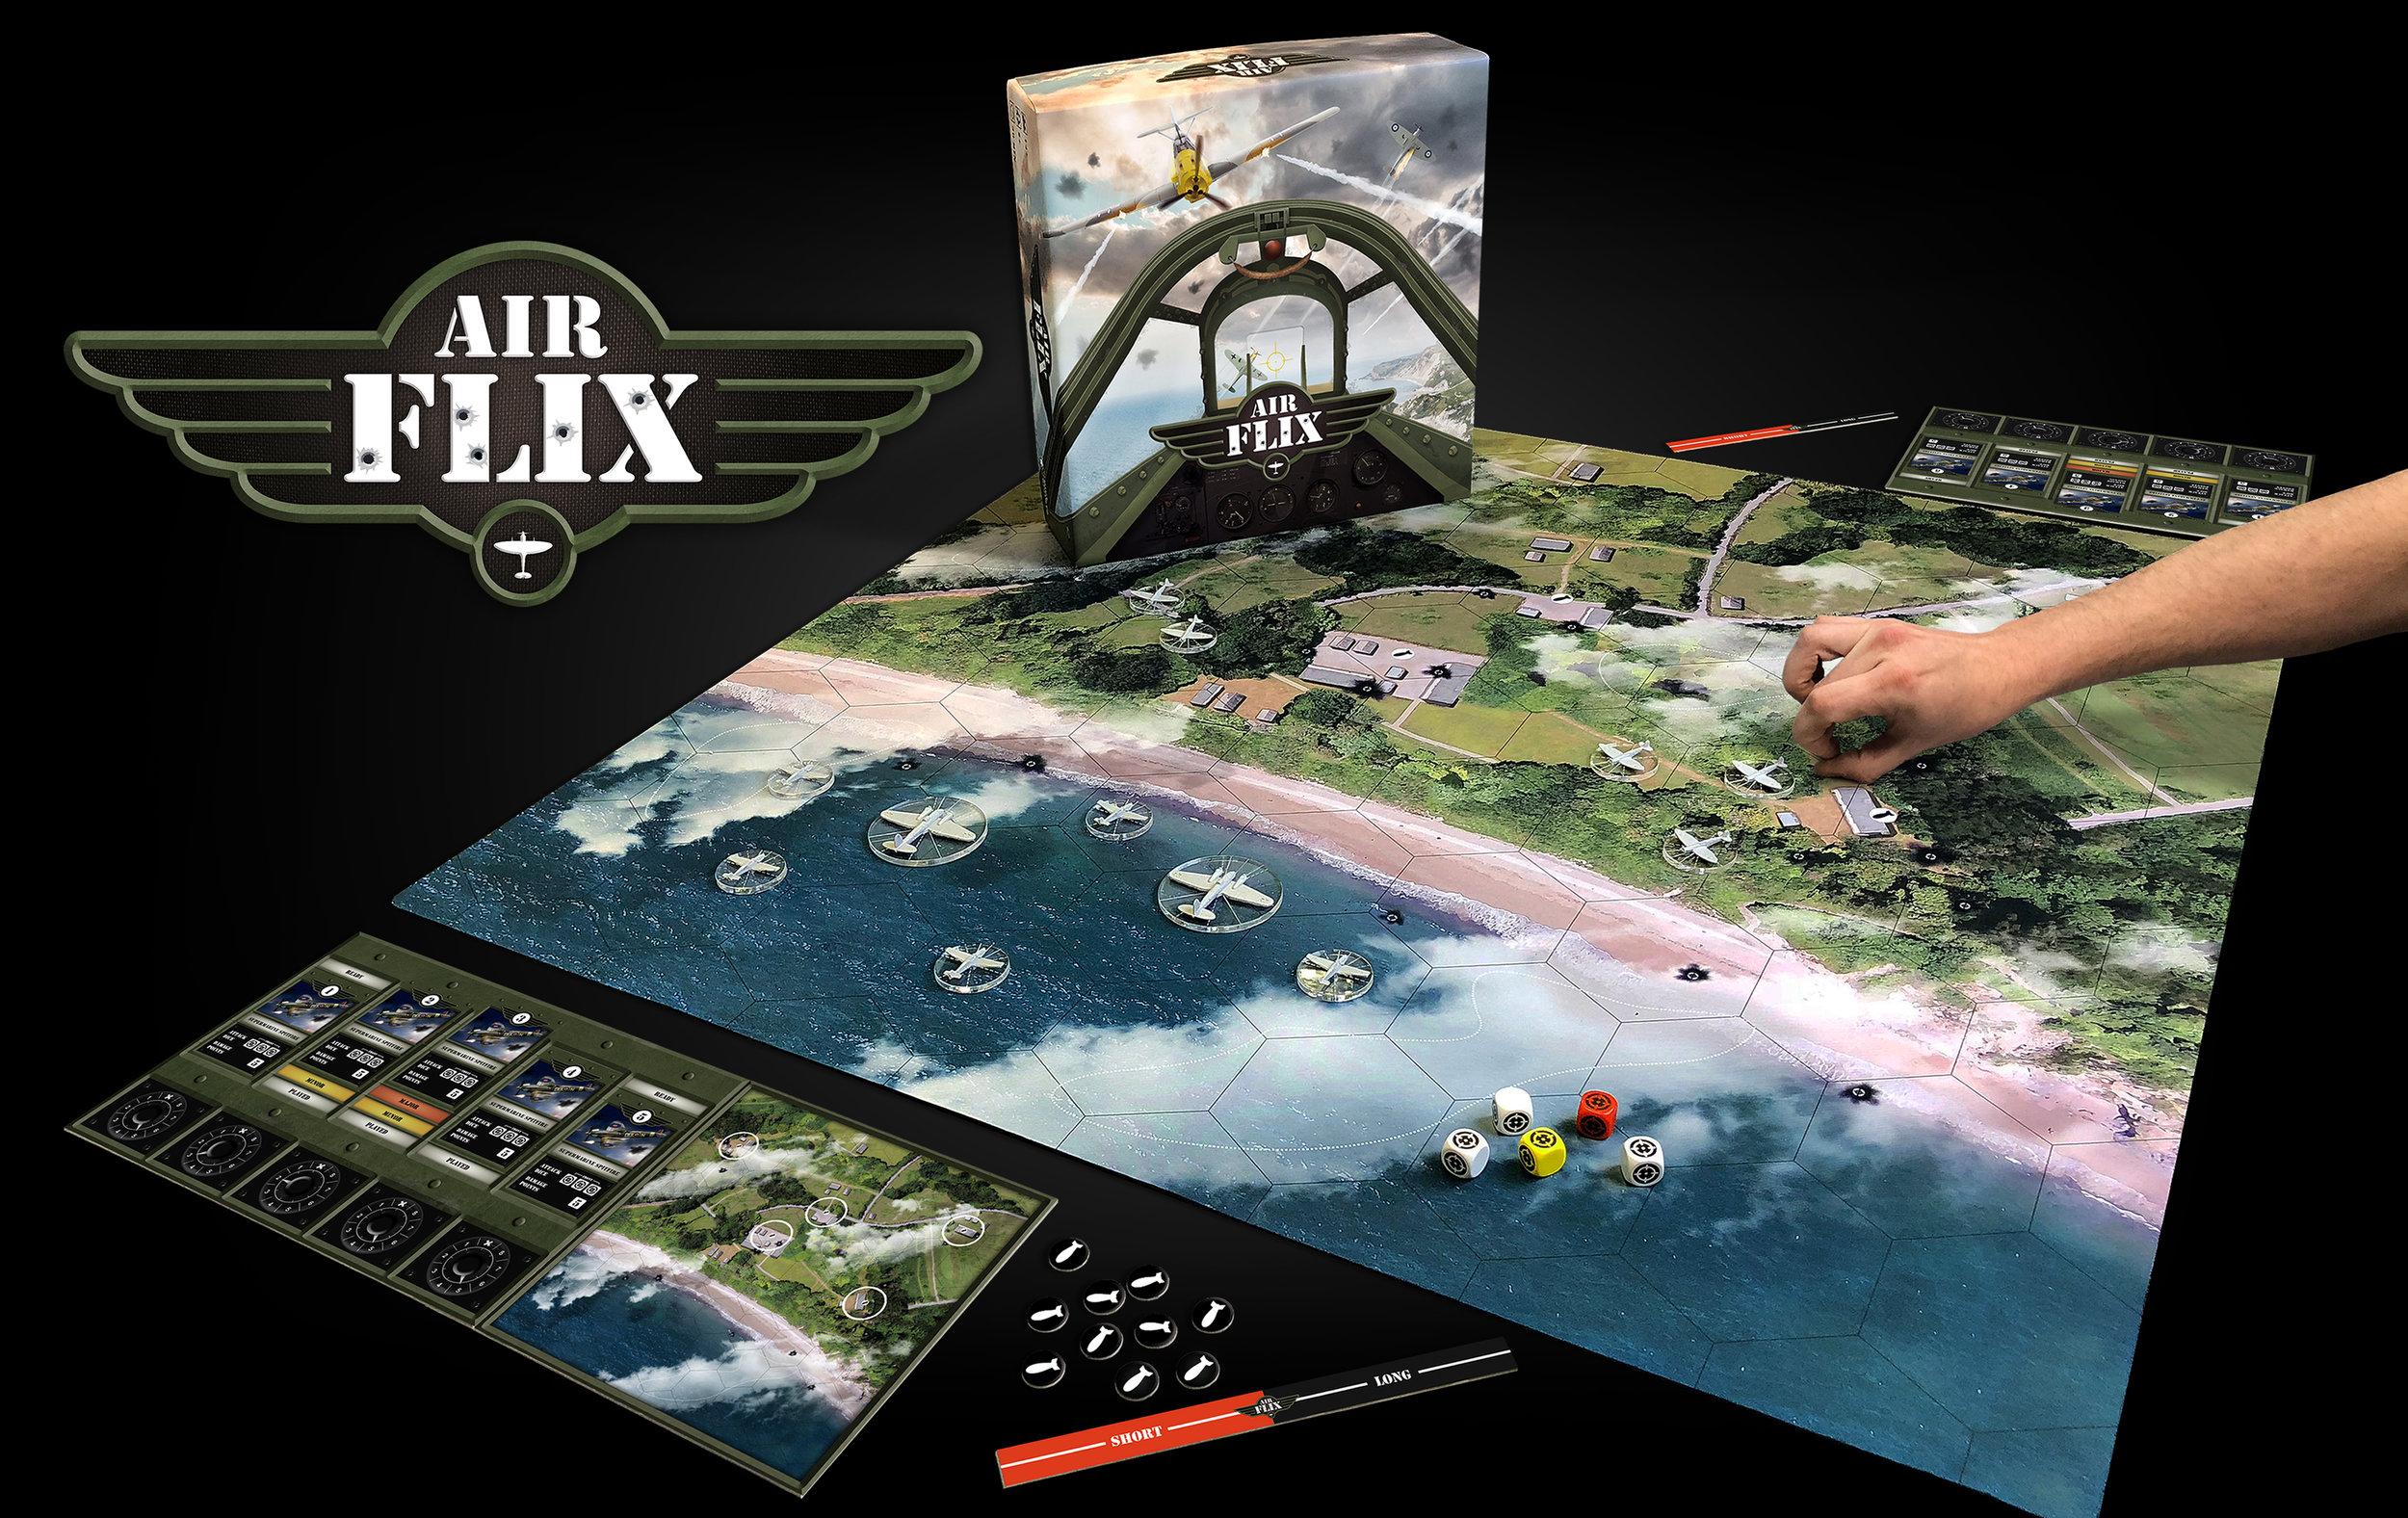 flix marketing image.jpg